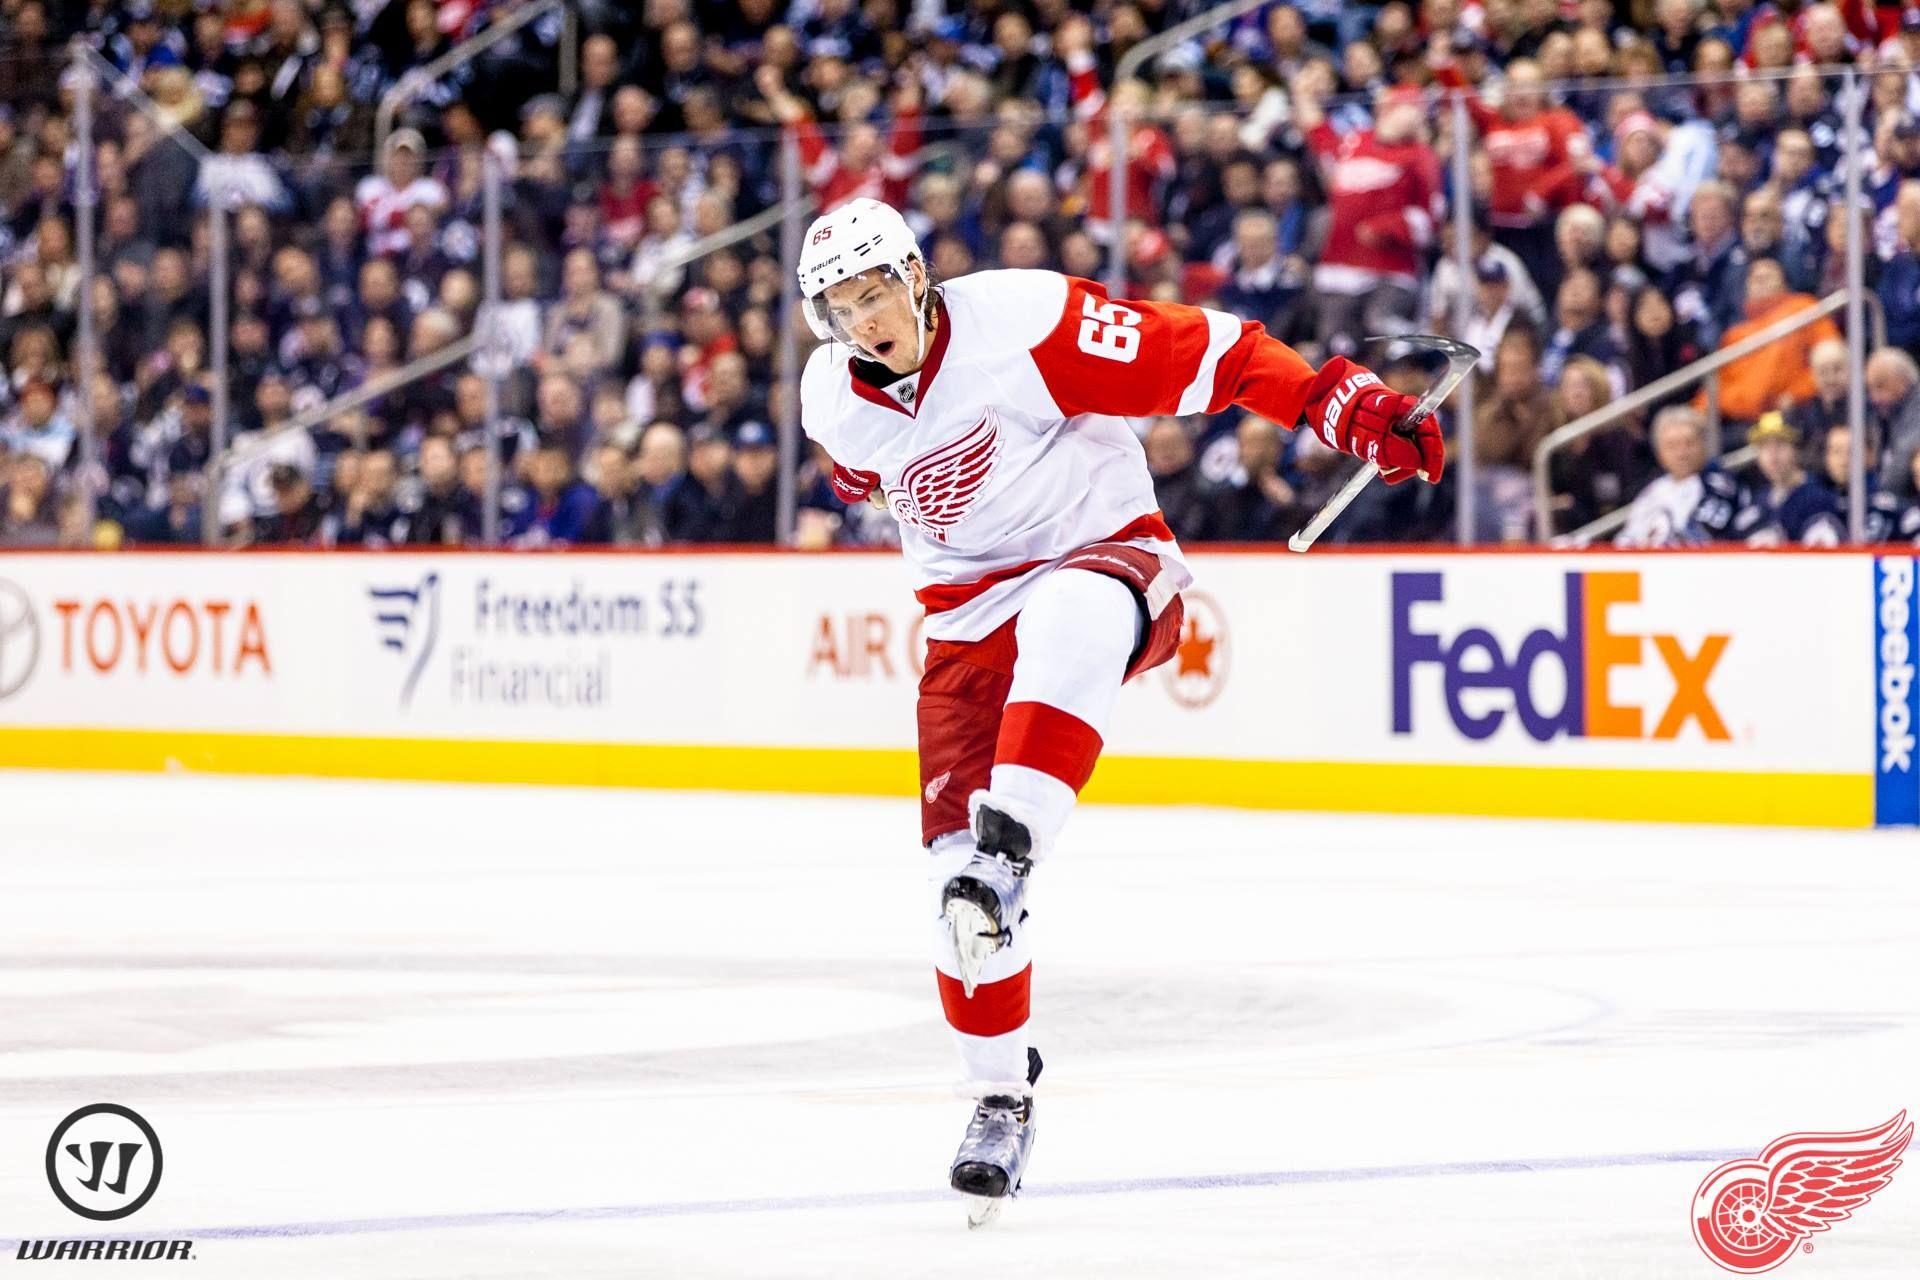 DK's reaction to scoring his 1st NHL goal! (11/4/13